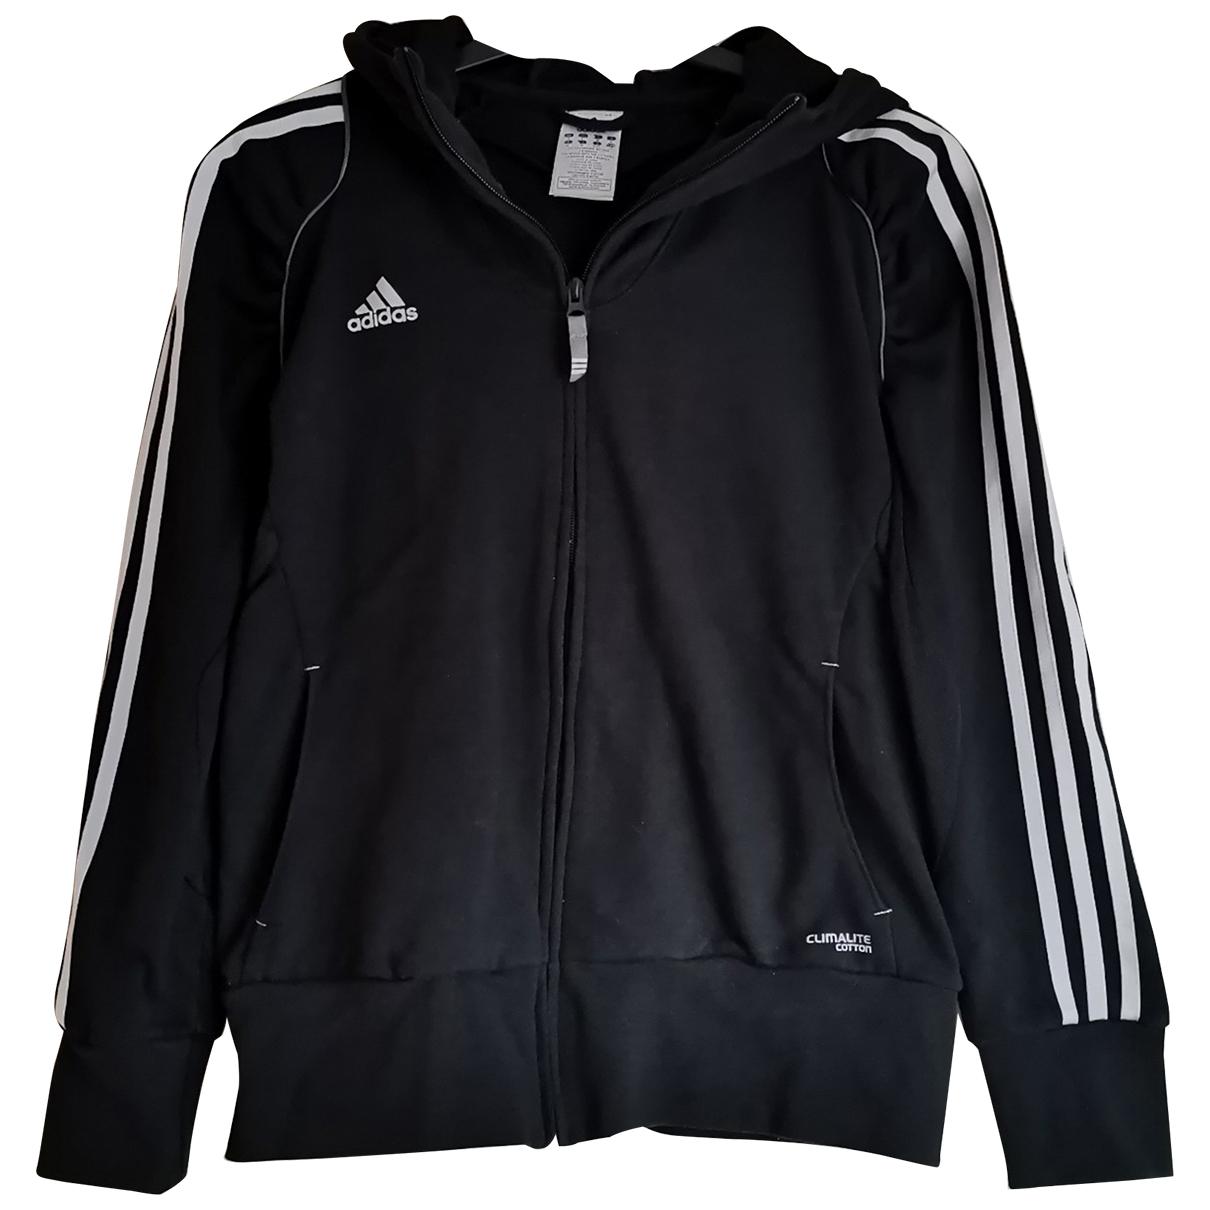 Adidas \N Jacke in  Schwarz Baumwolle